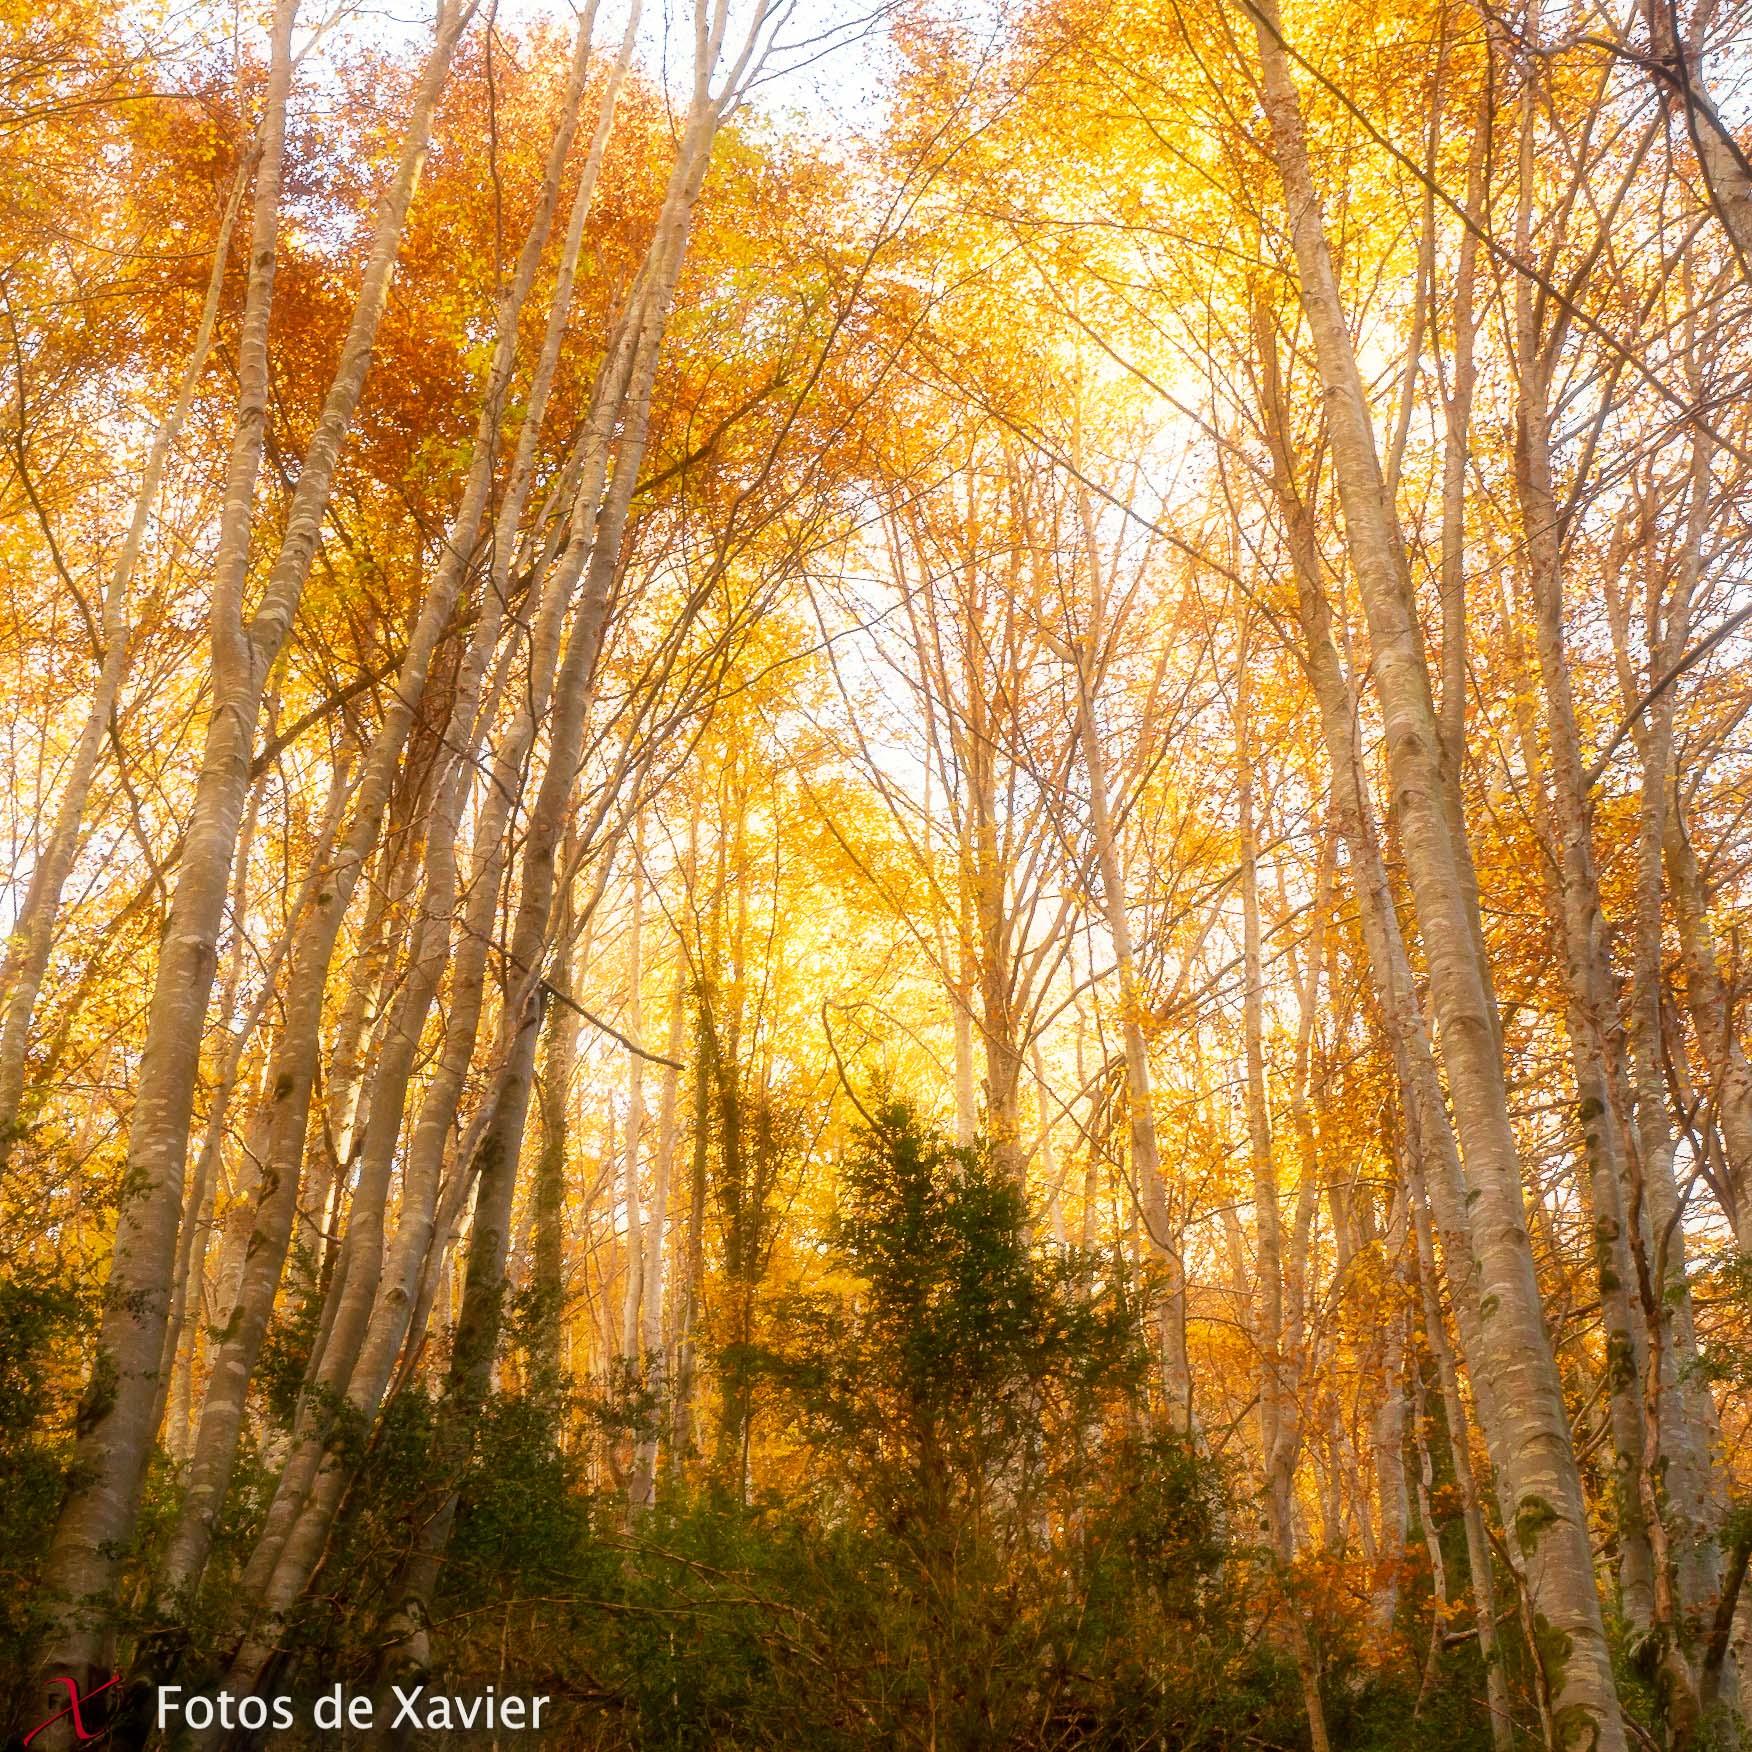 Restes de tardor - Luz - Fotos de Xavier. Fotografia de naturaleza y paisaje. Xavier Linares